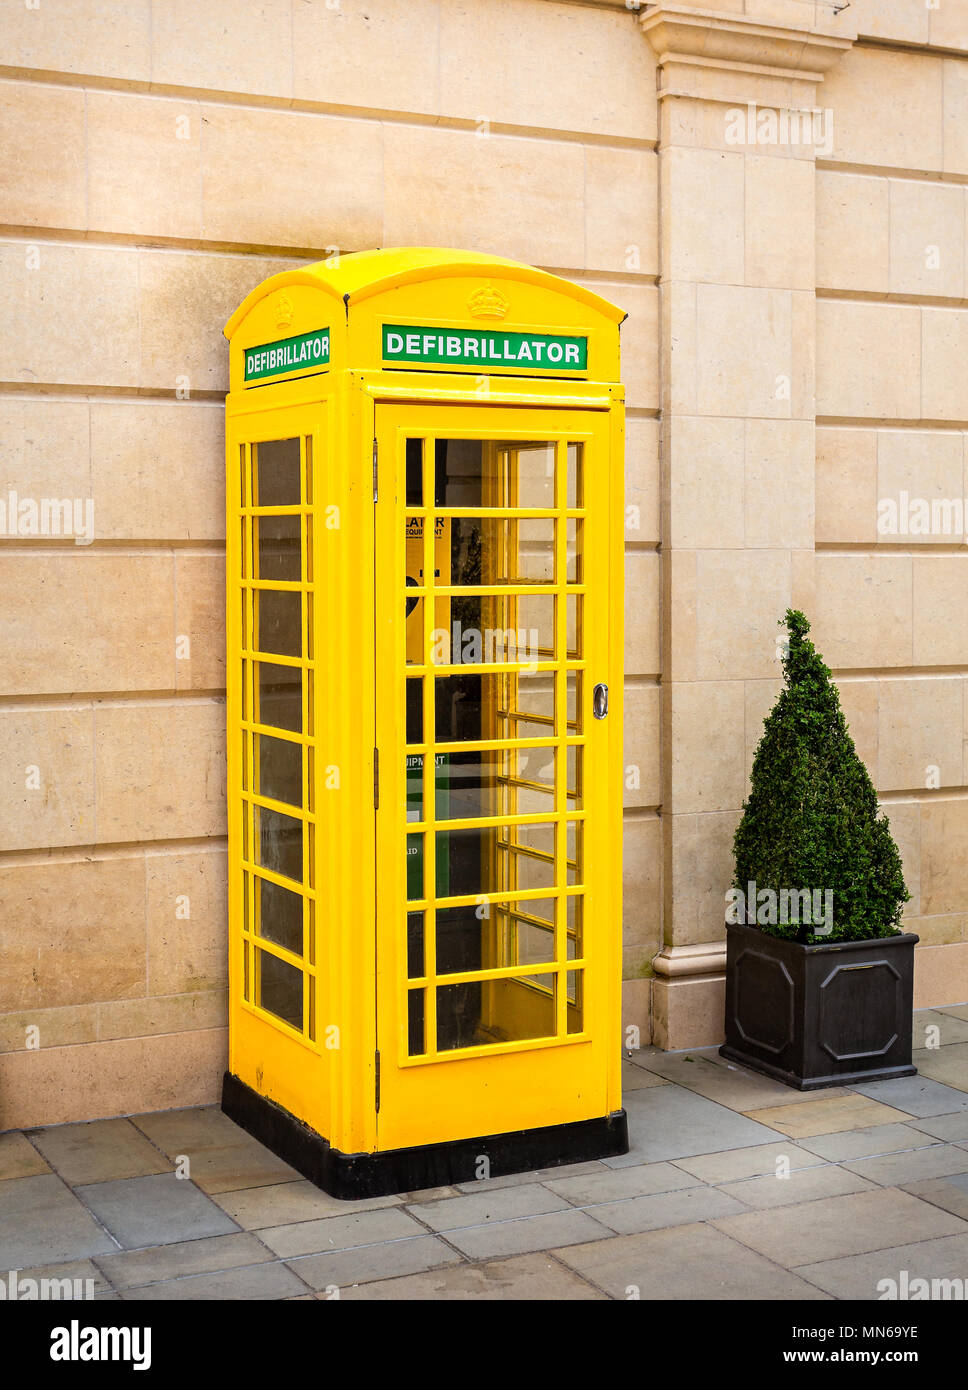 Defibrillator in yellow telephone kiosk in Southgate Shopping Centre, Bath, Somerset, UK taken on 13 May 2018 - Stock Image